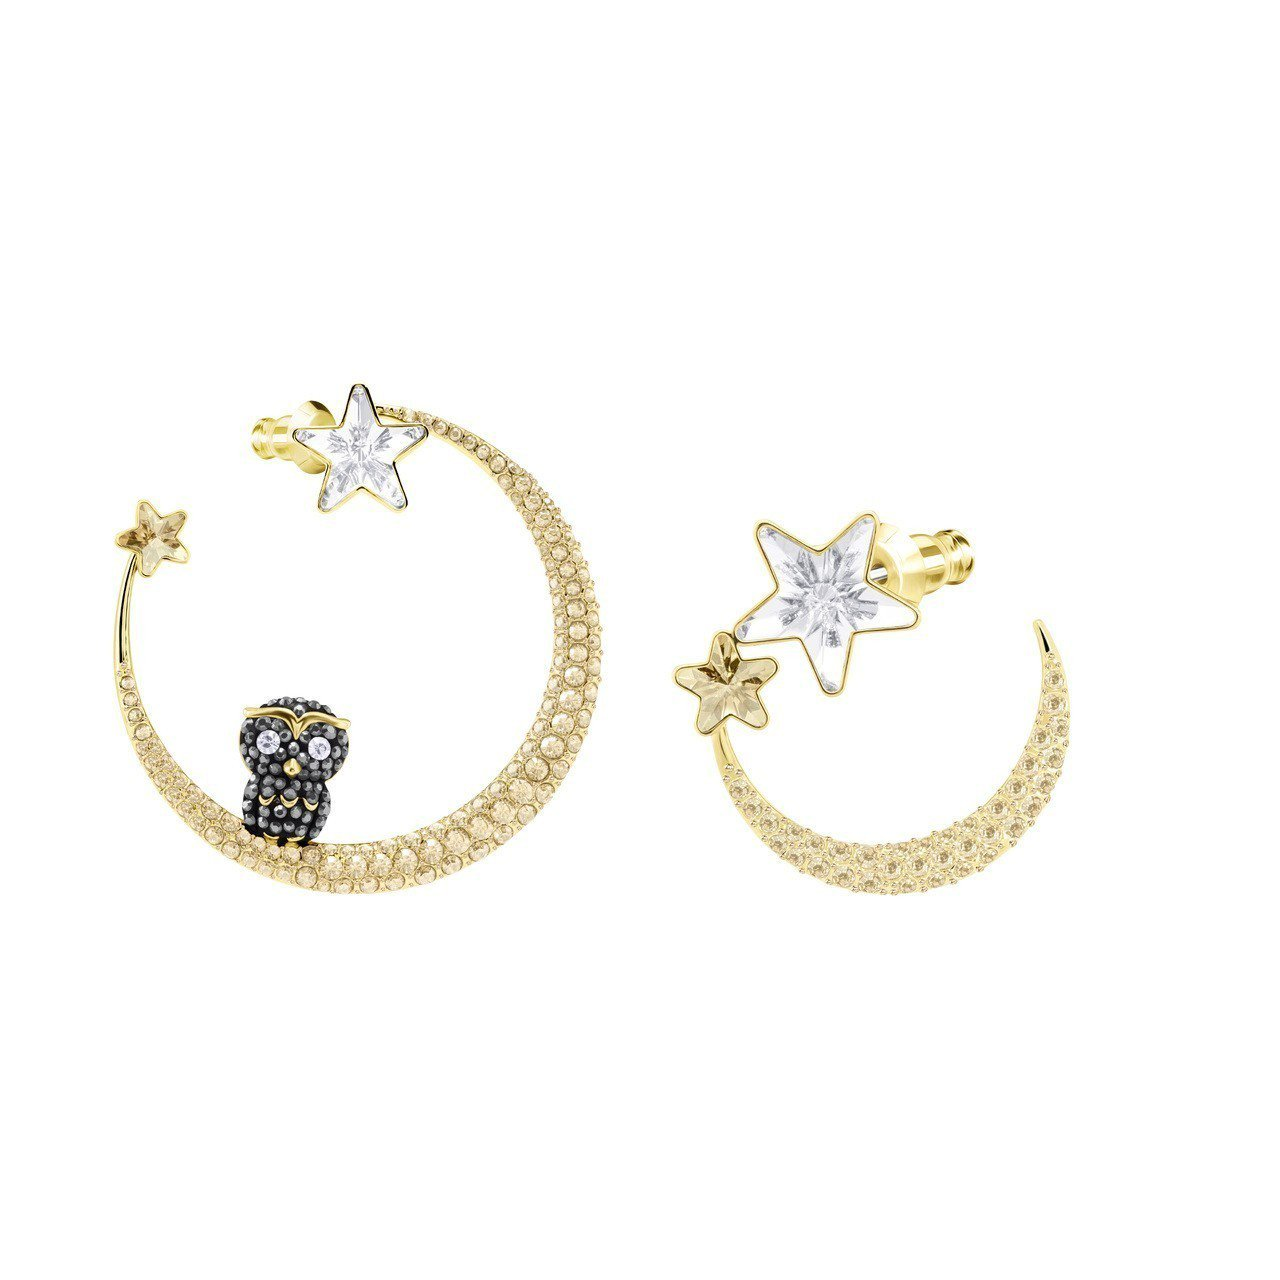 Little 穿孔耳環,5,990元。圖/施華洛世奇提供